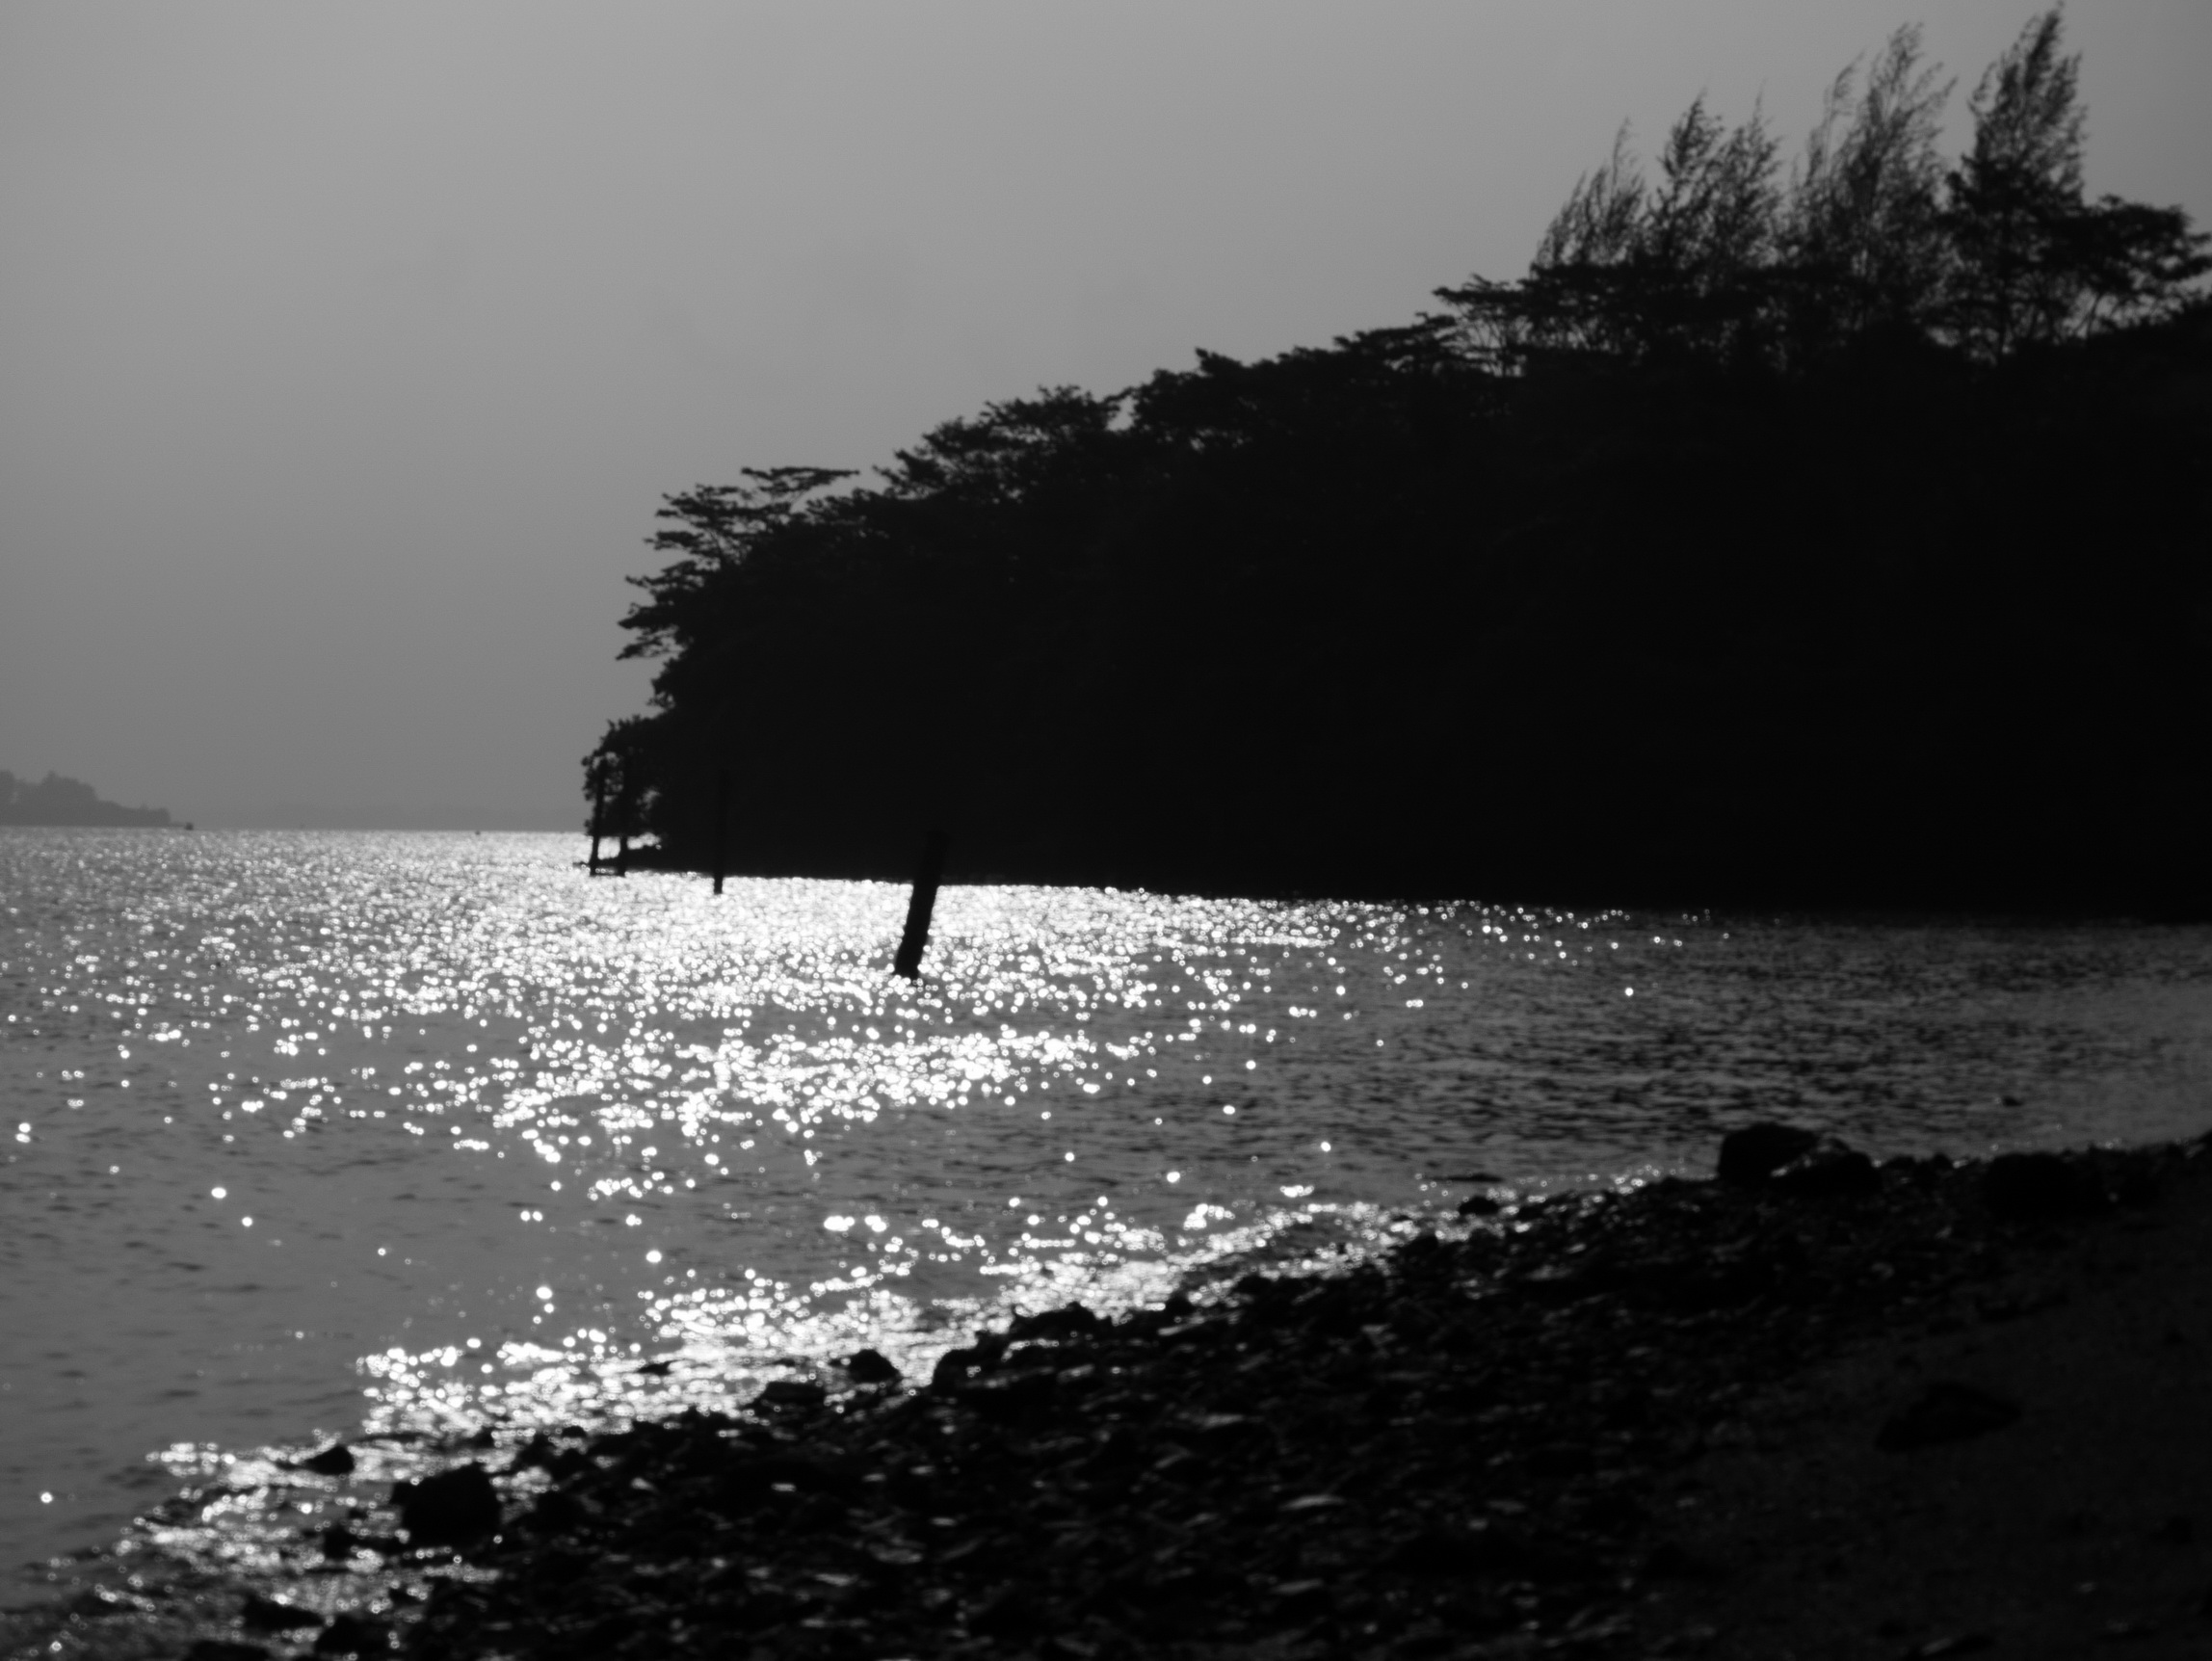 Pulau Ubin_5